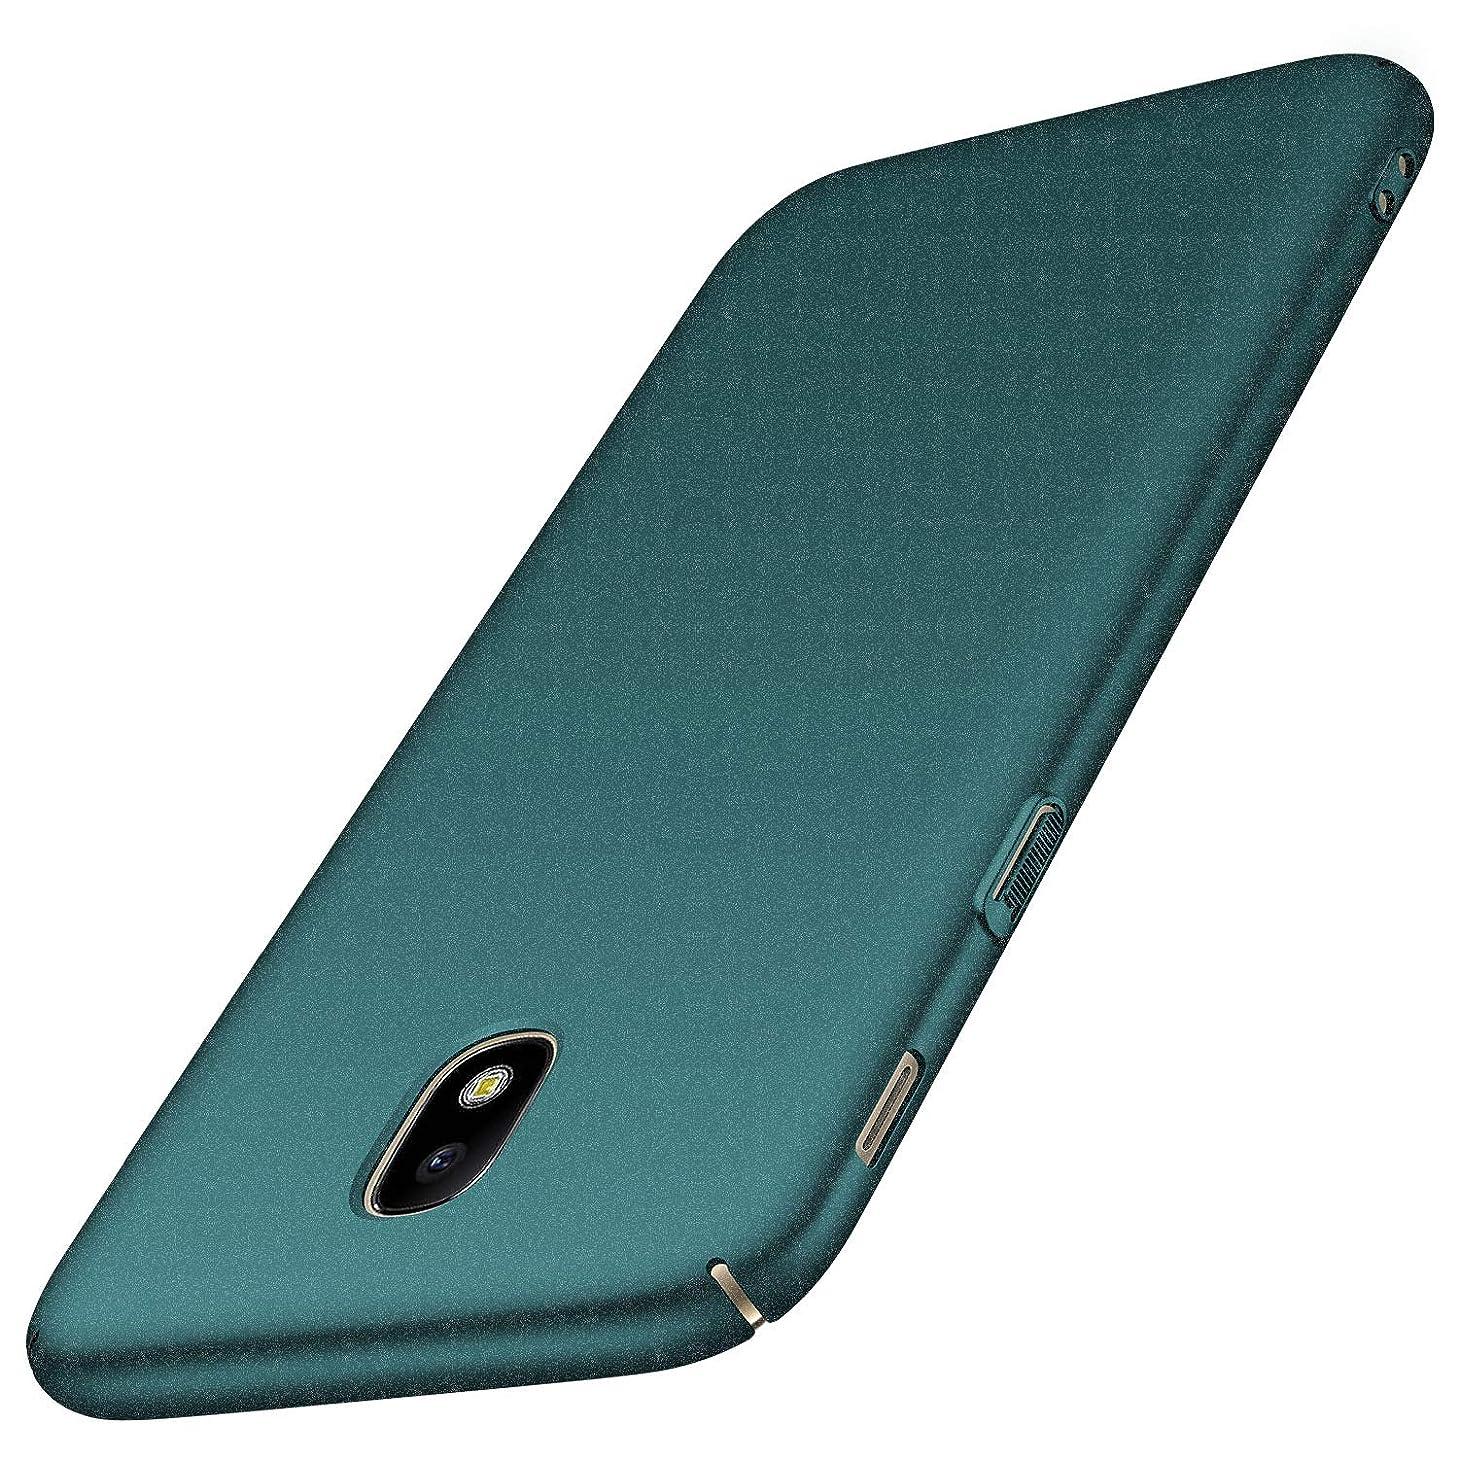 Avalri for Samsung Galaxy J5 2017 Case, Ultra Thin Anti-Fingerprint and Minimalist Hard PC Cover for Galaxy J5 2017 (Matte Green)